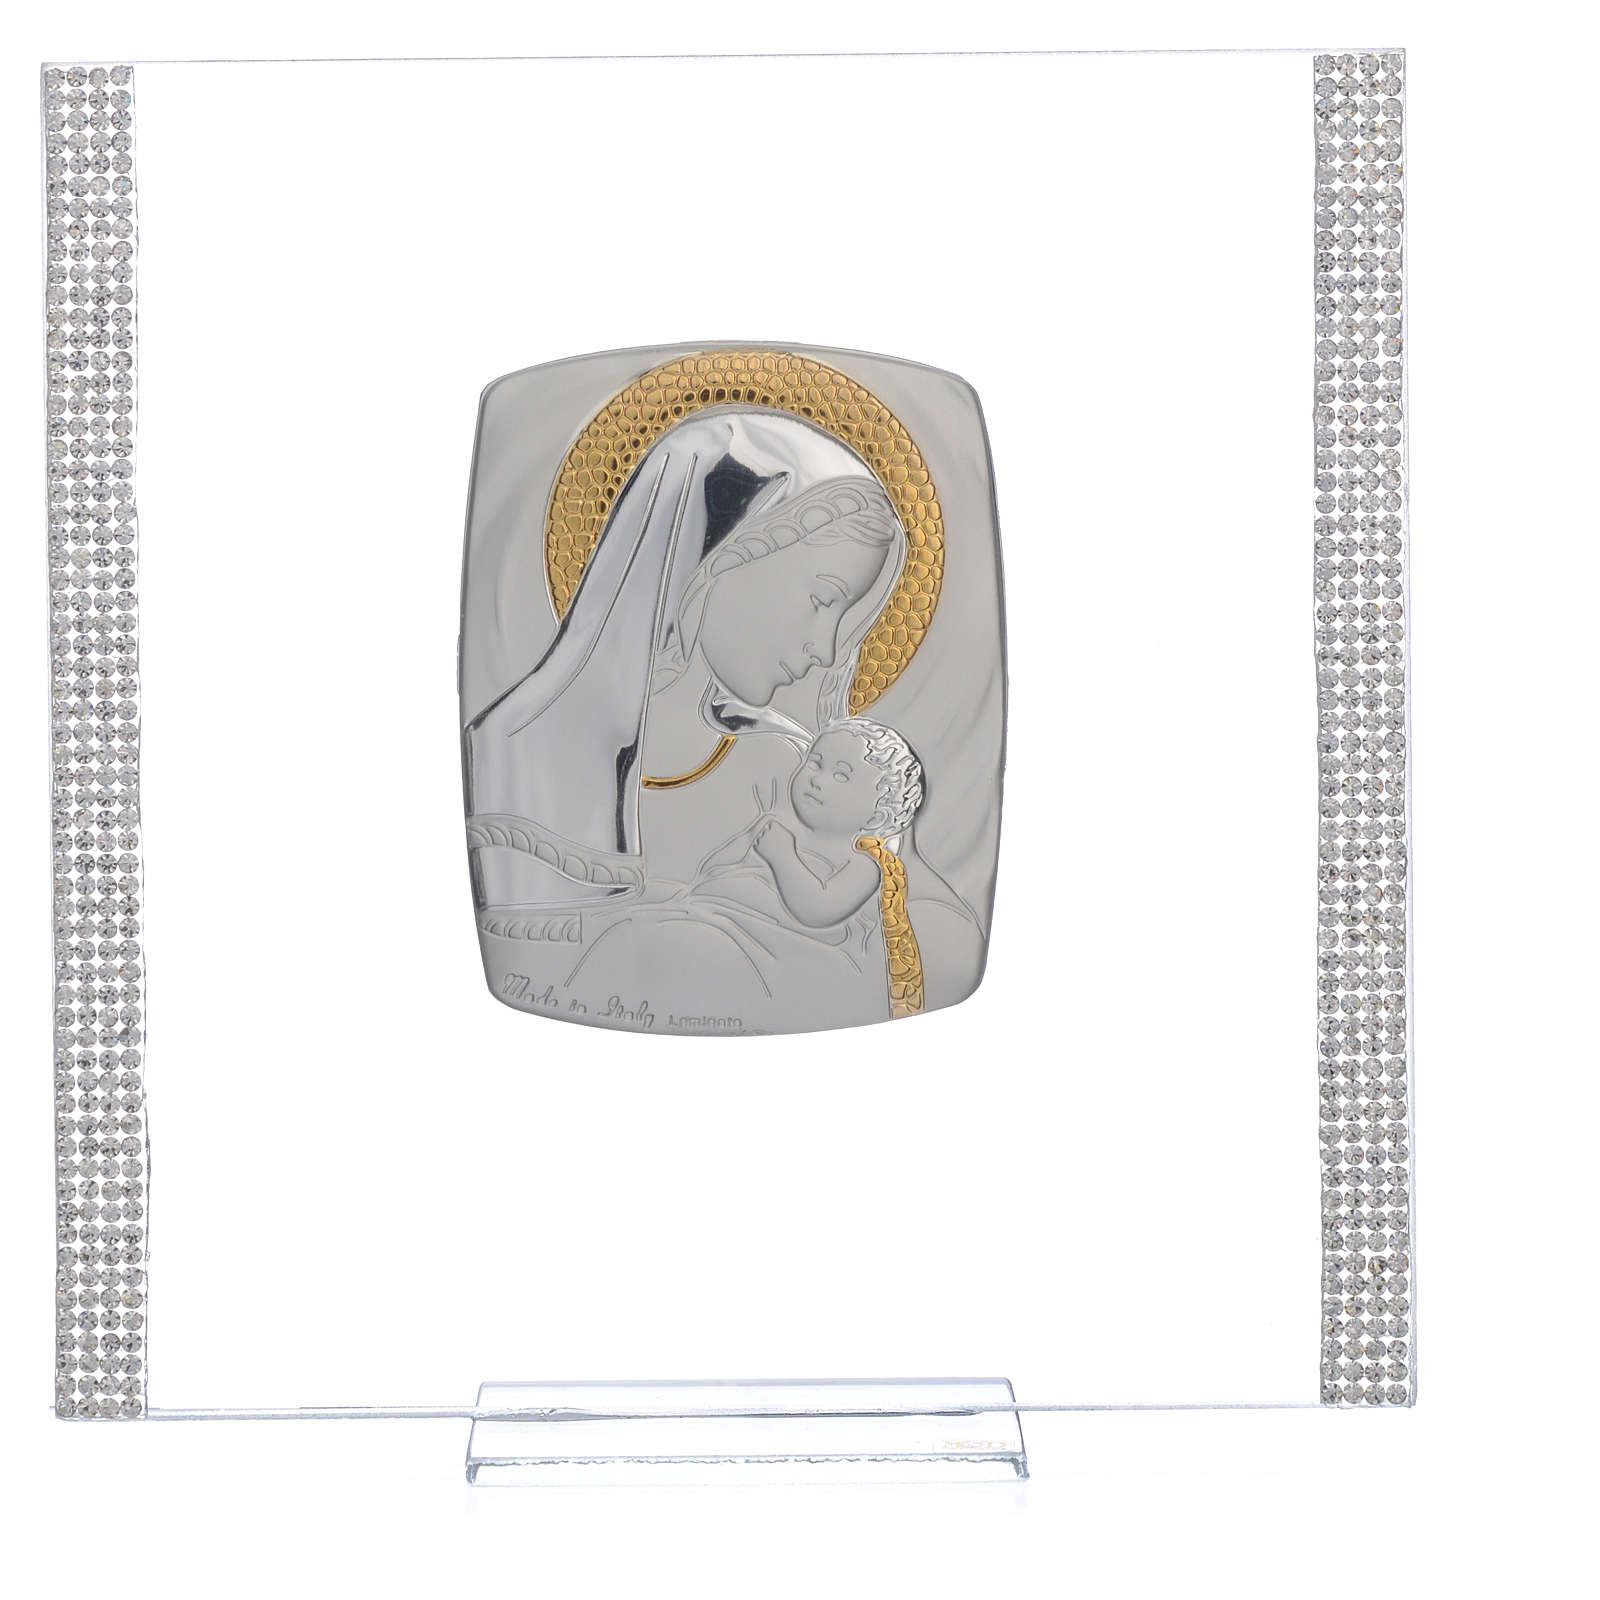 Quadro Battesimo Arg. e strass Maternità 17,5x17,5 cm 3